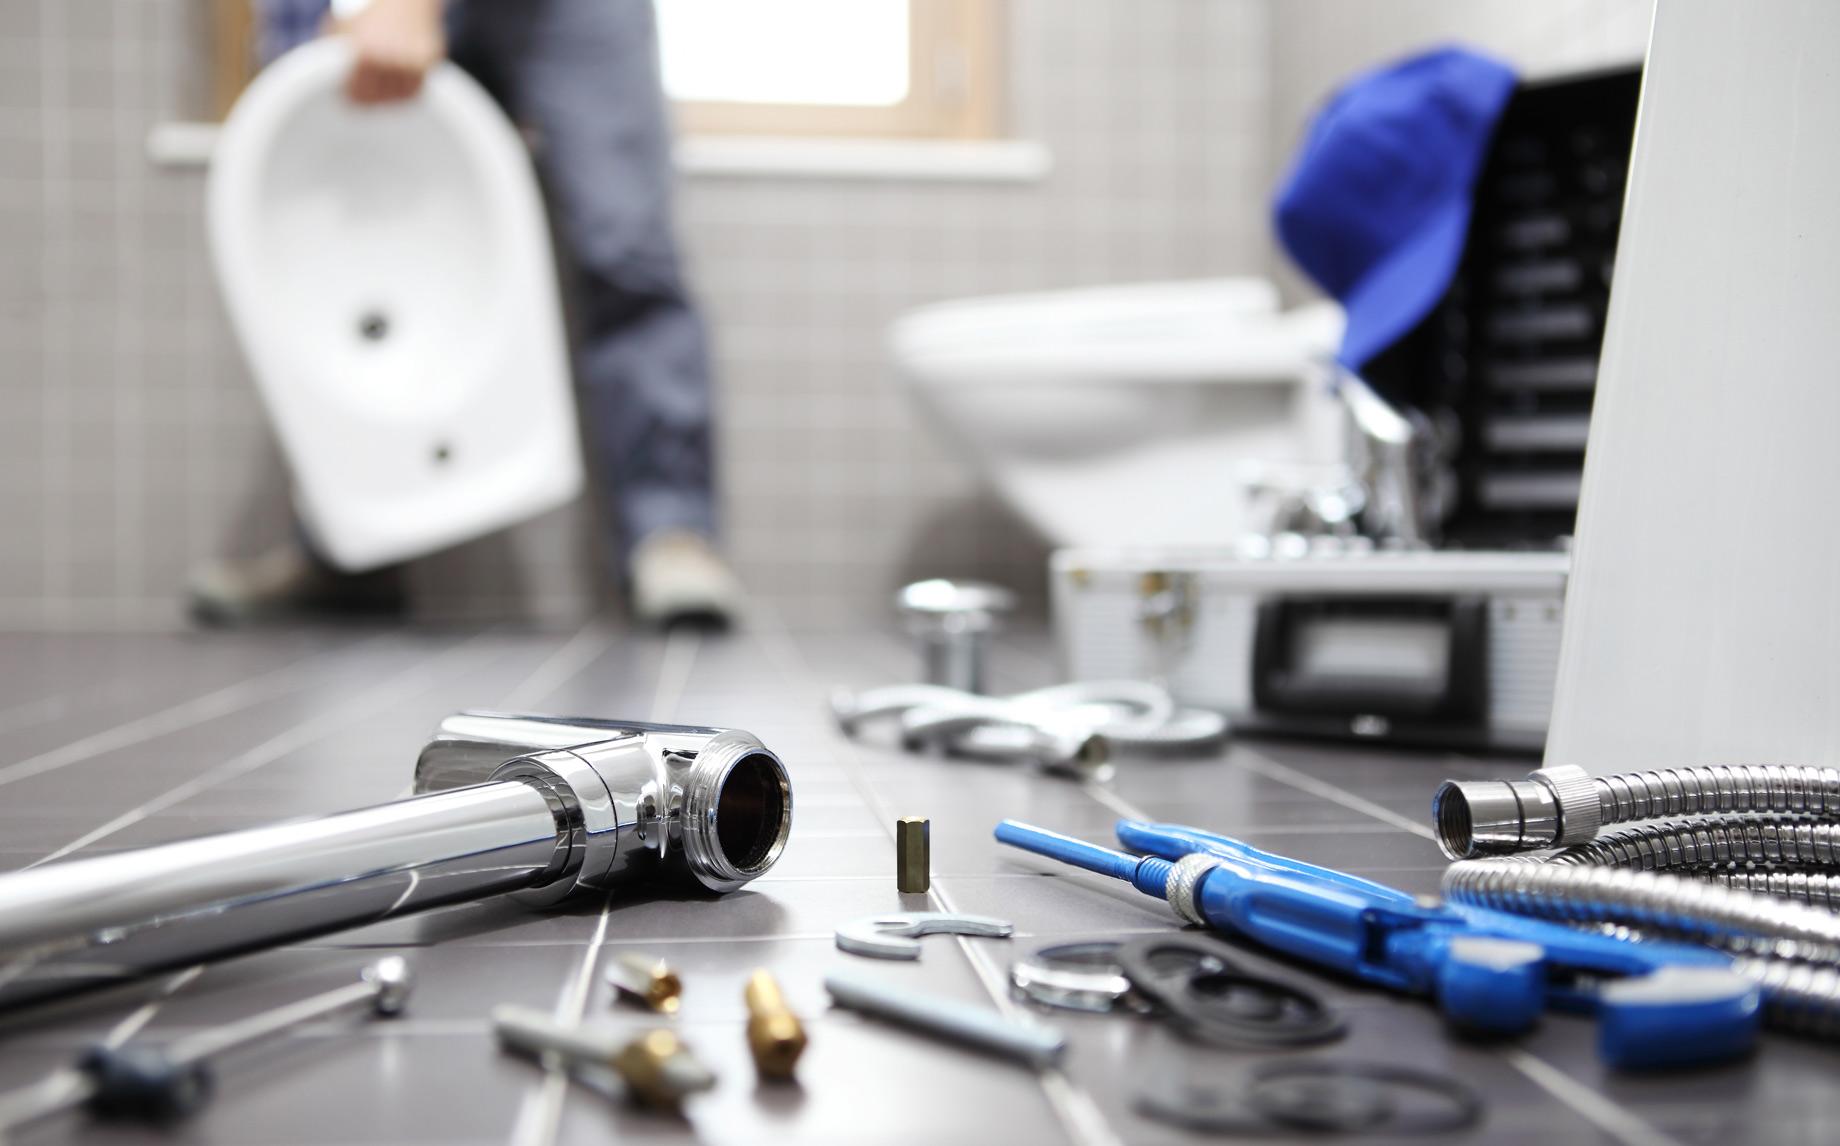 Plumbing repairs in Monaco